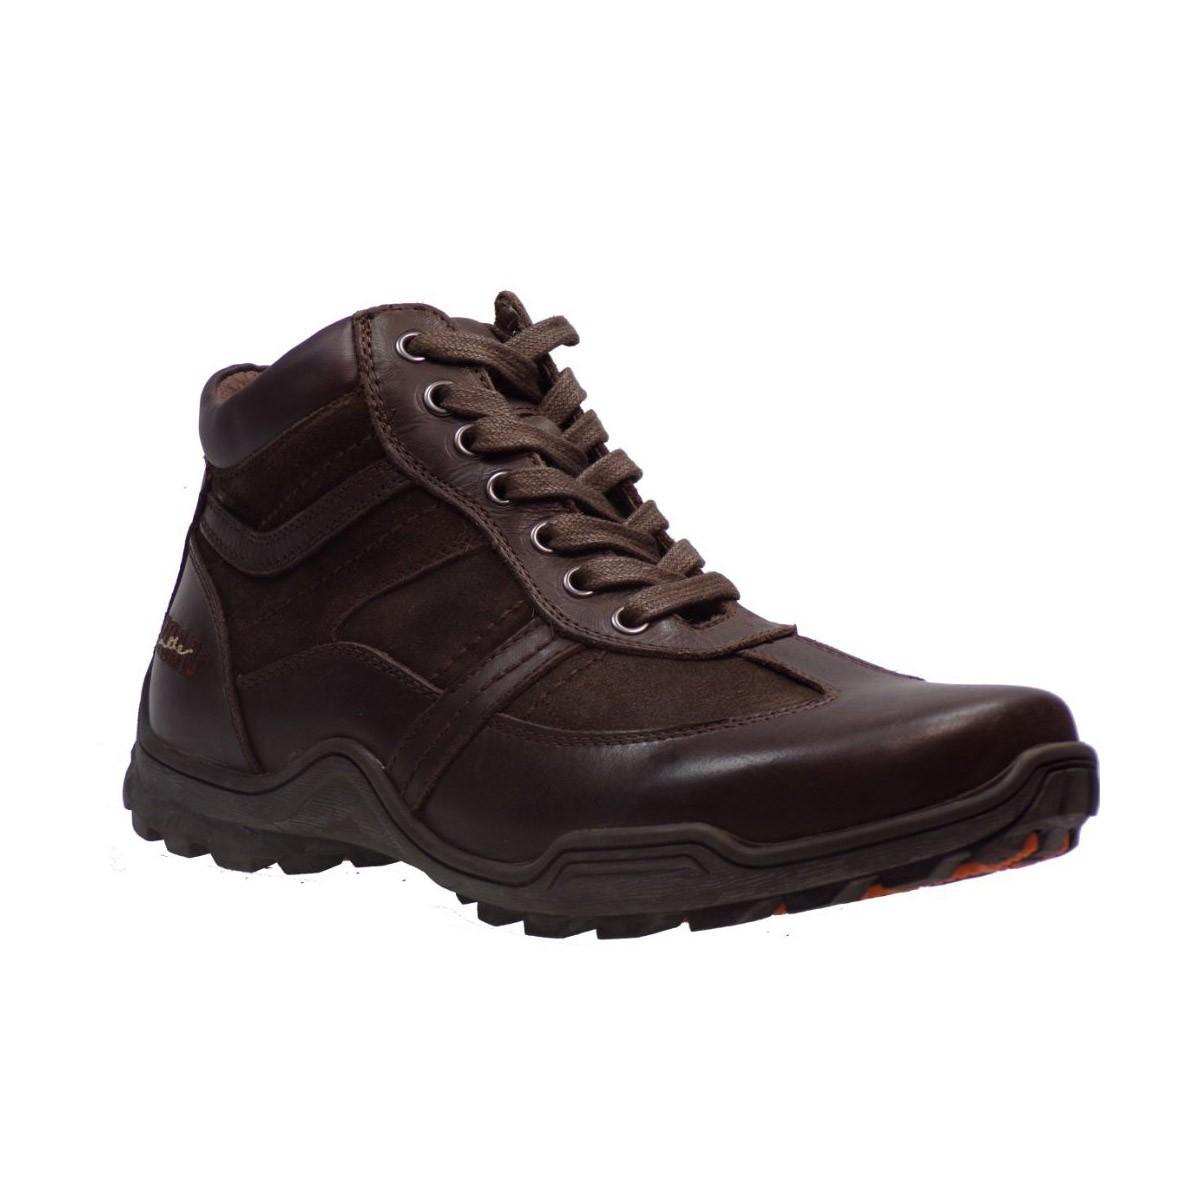 Road Ανδρικά Παπούτσια Μποτάκια 14926 Καφέ